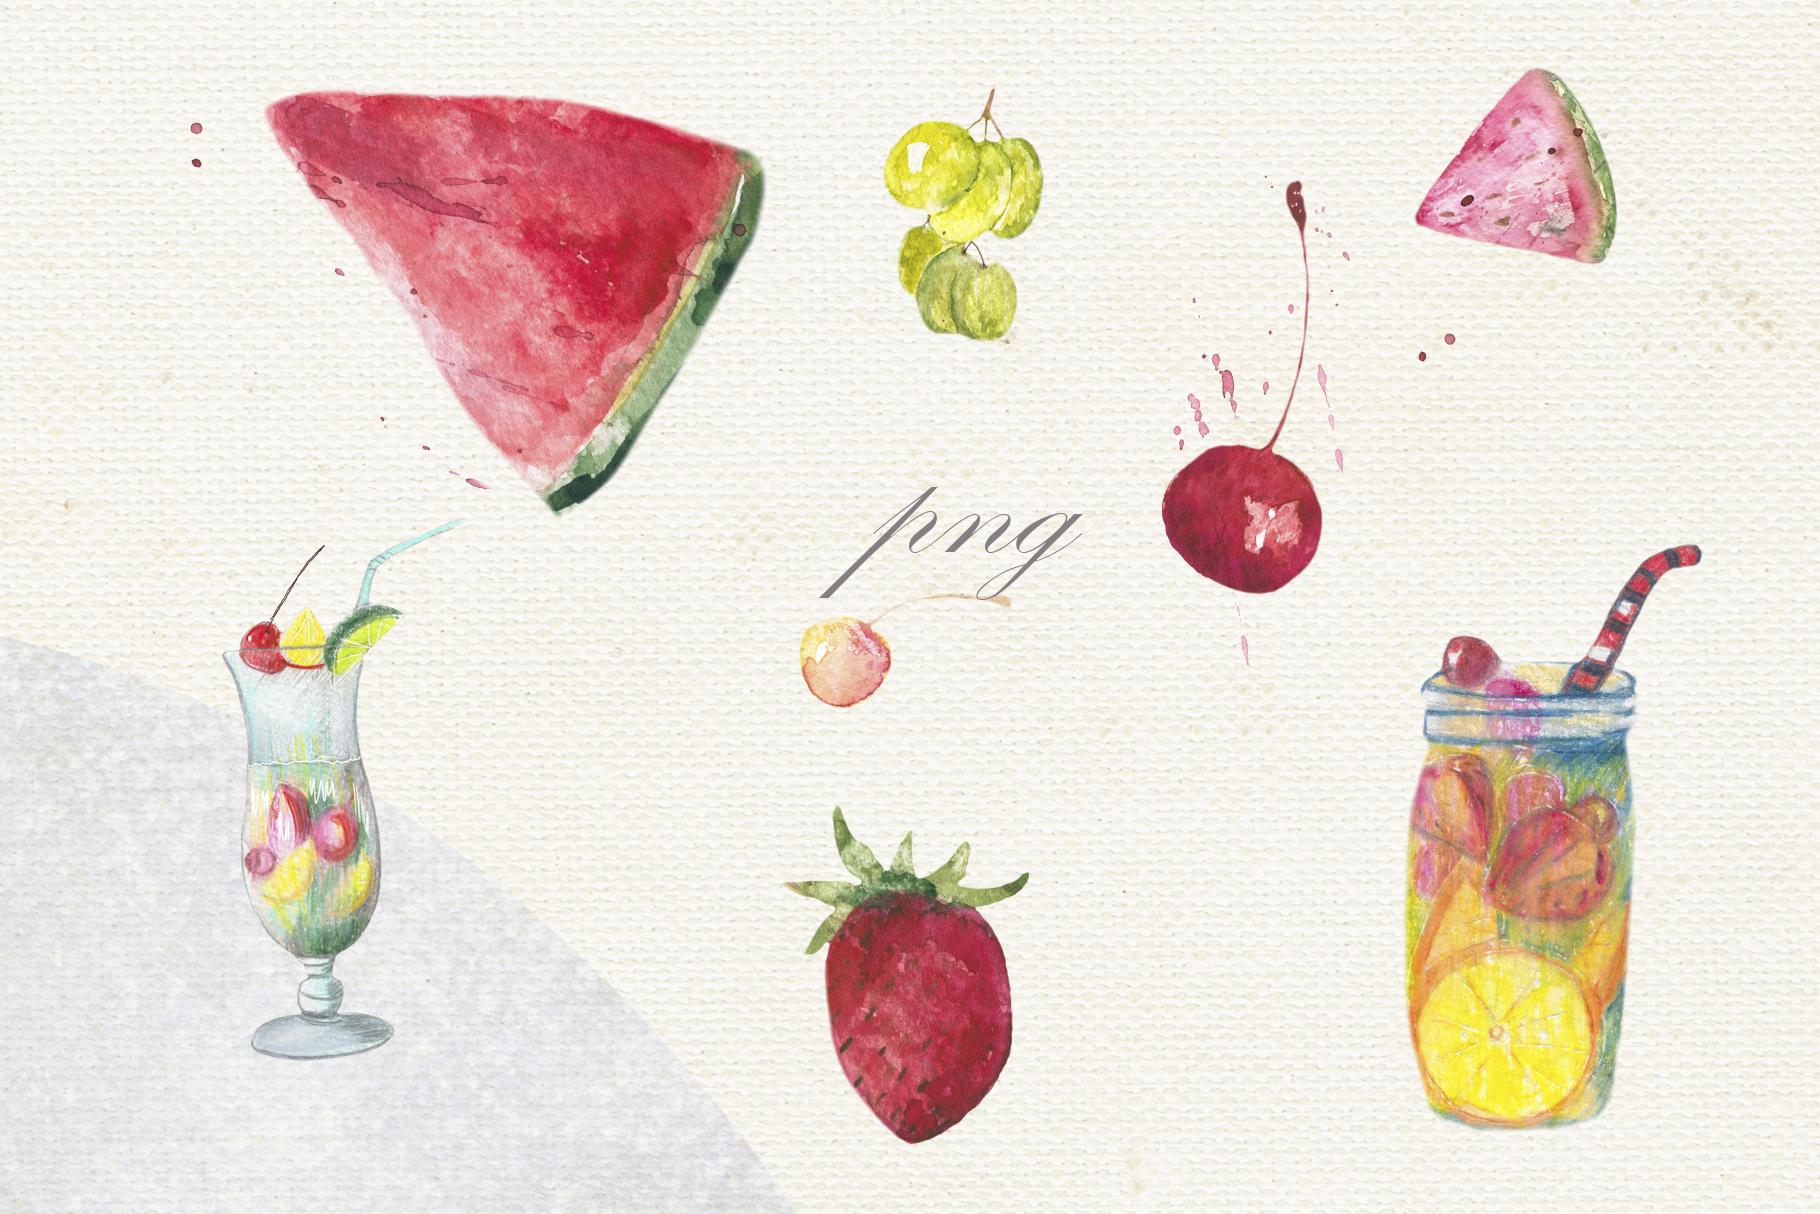 Fruit vegetables food watercolor example image 7